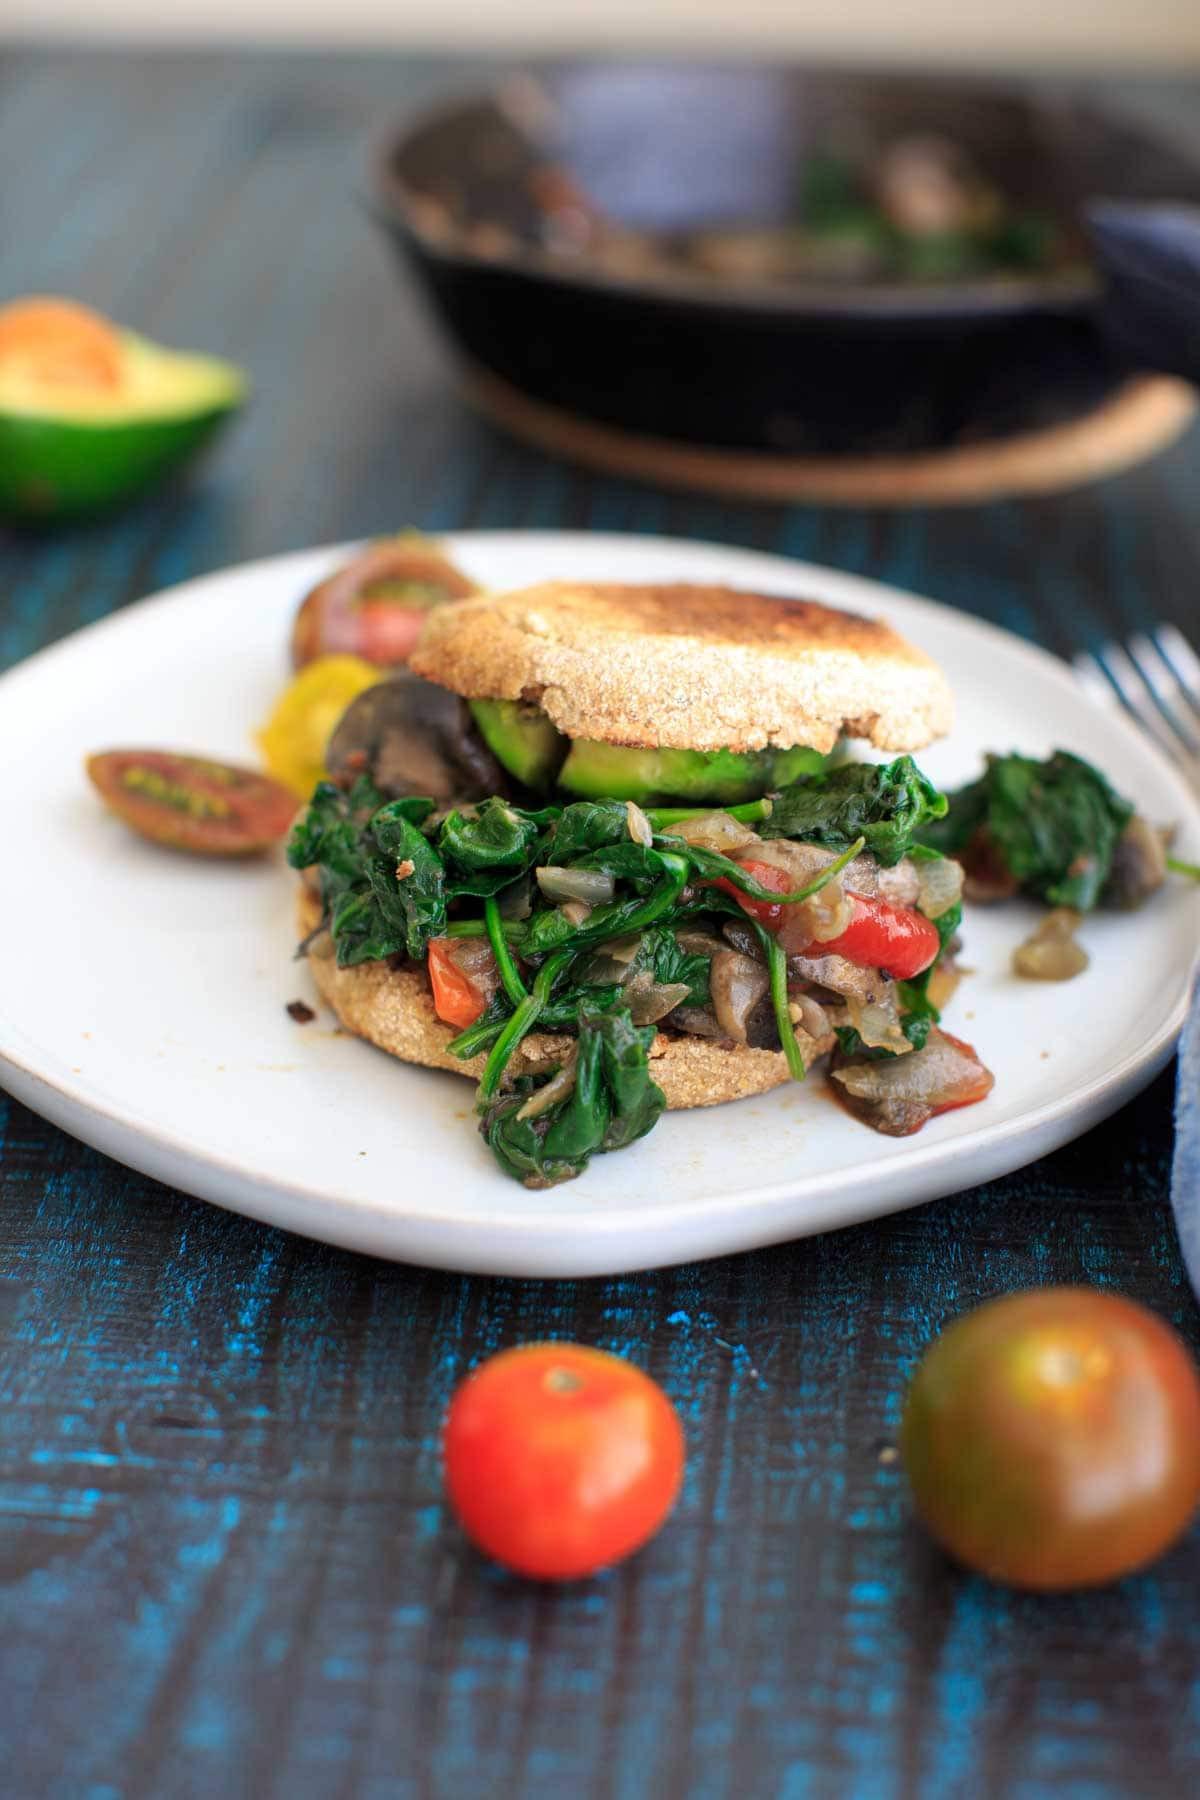 Vegan Breakfast Videos  Healthy Vegan Breakfast Ideas Fit Foo Finds